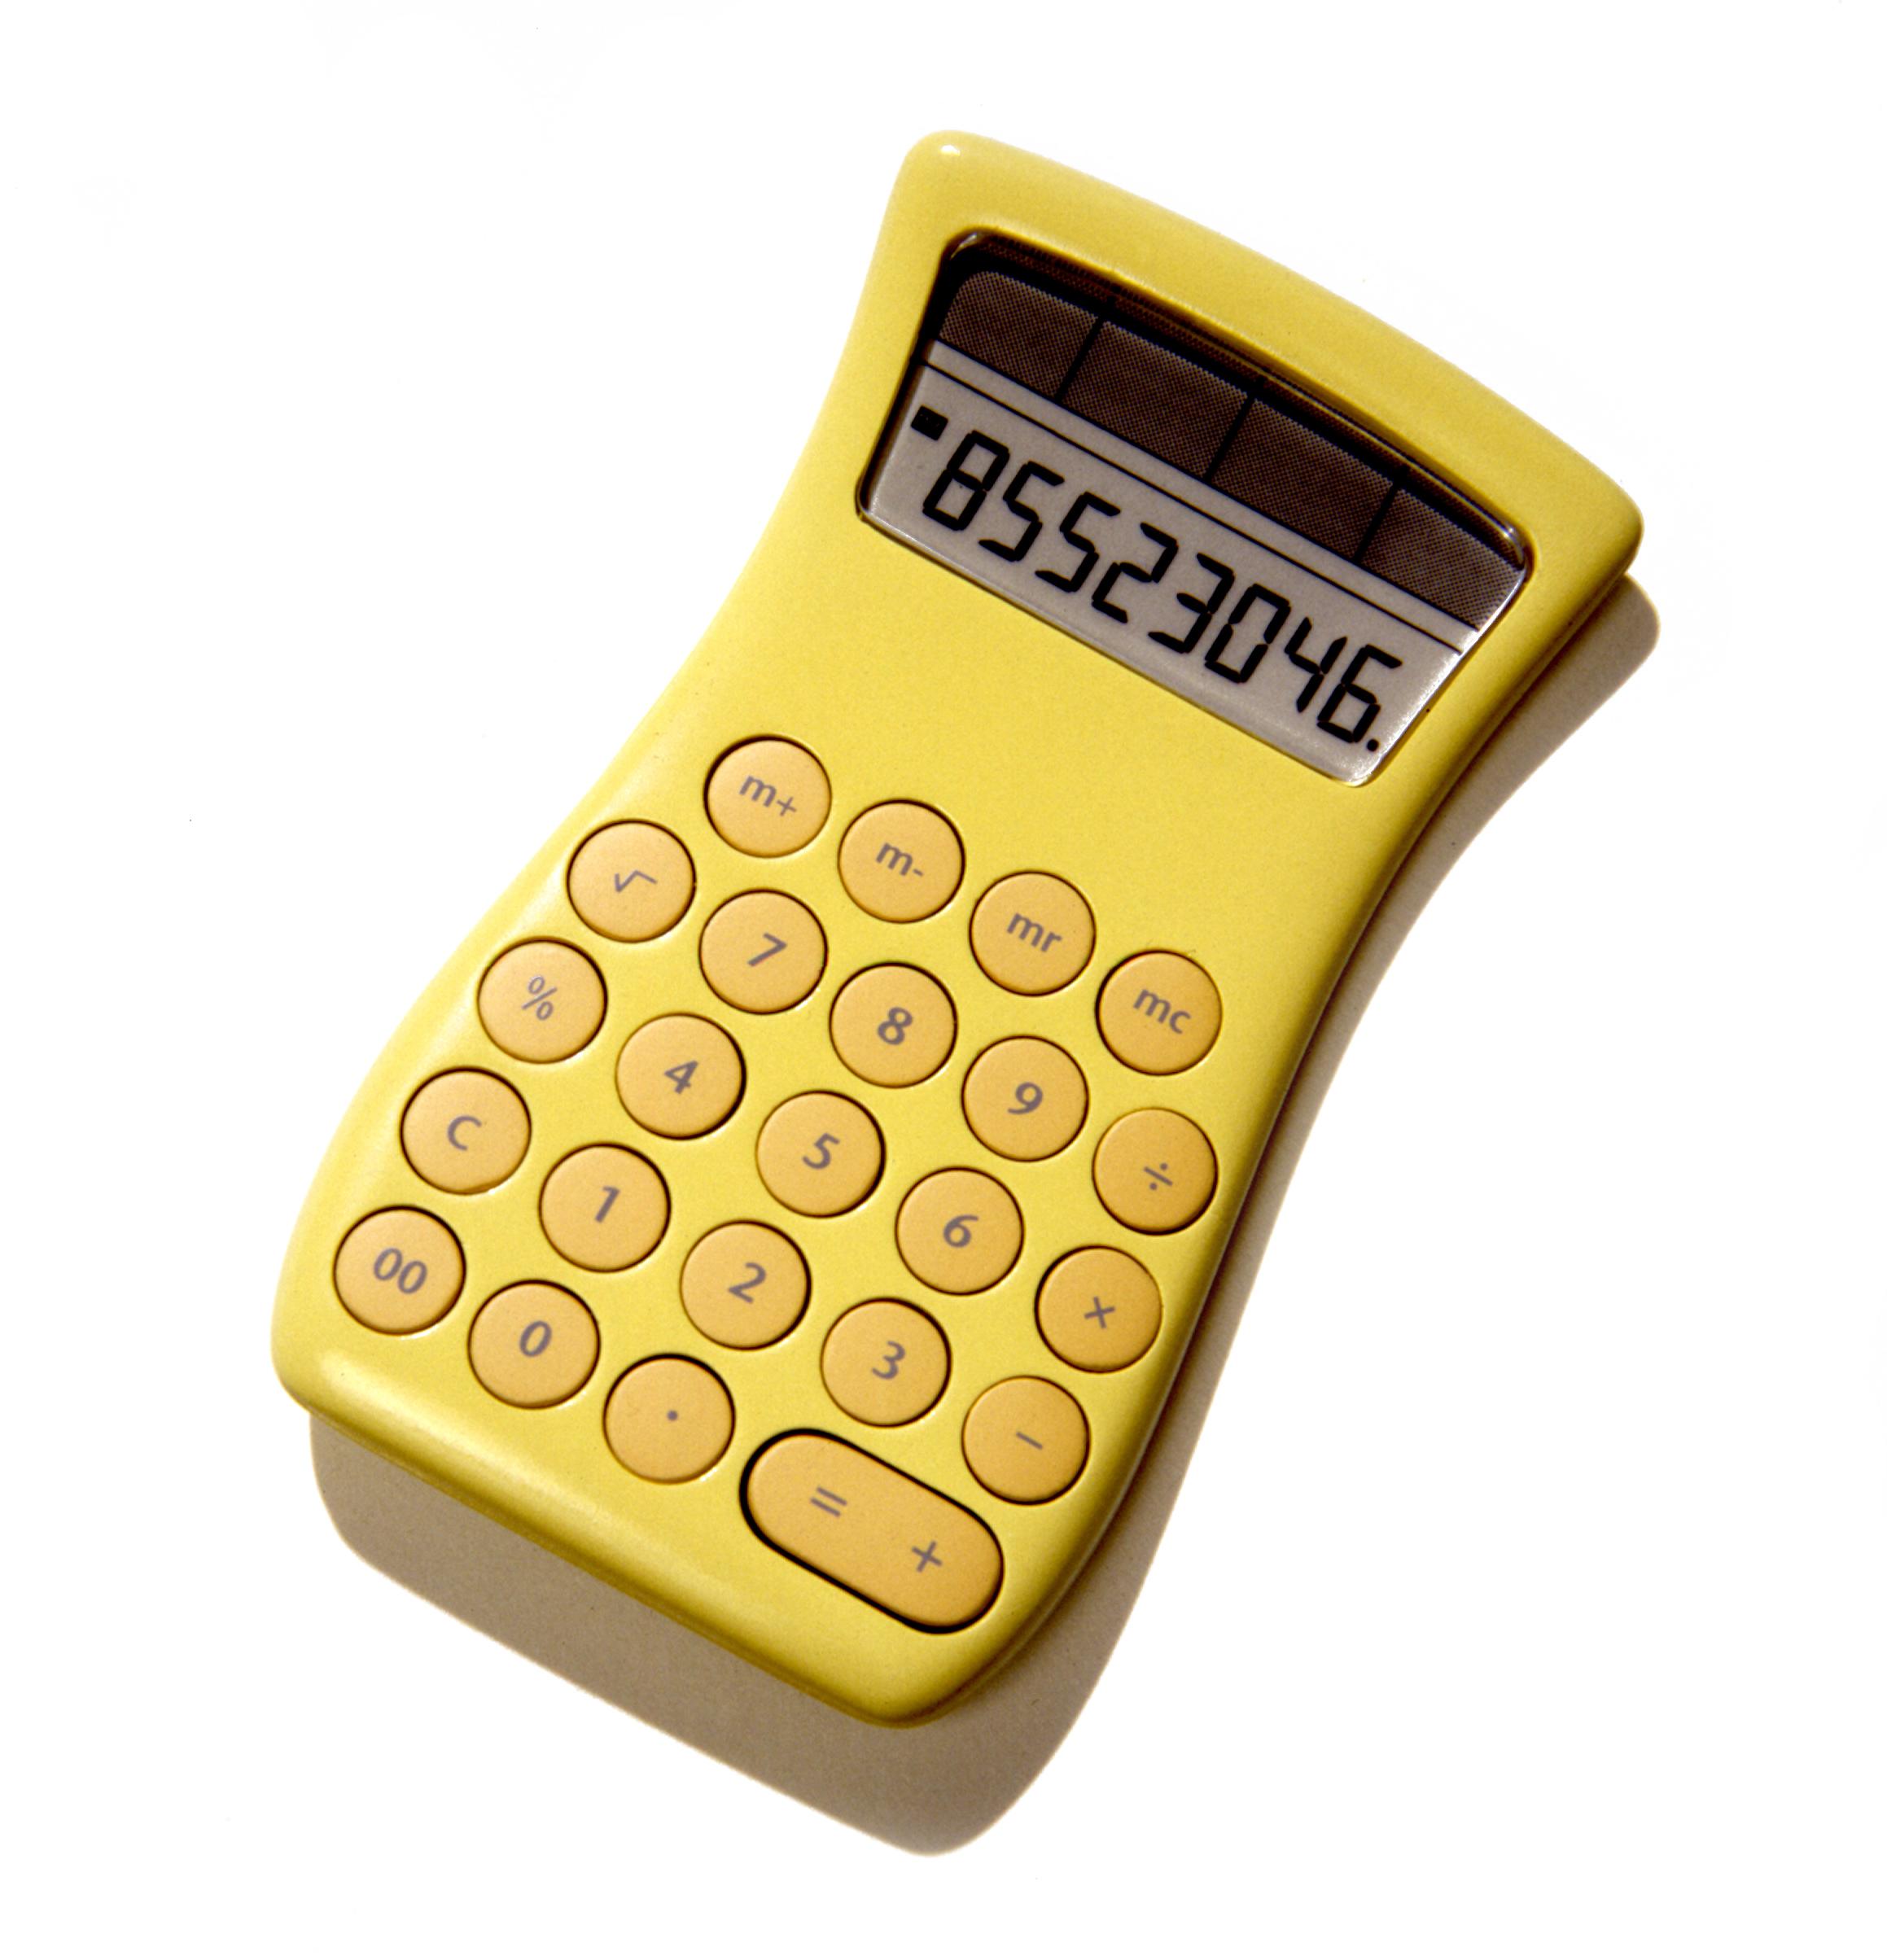 - Alessi_pocket calculator.jpg